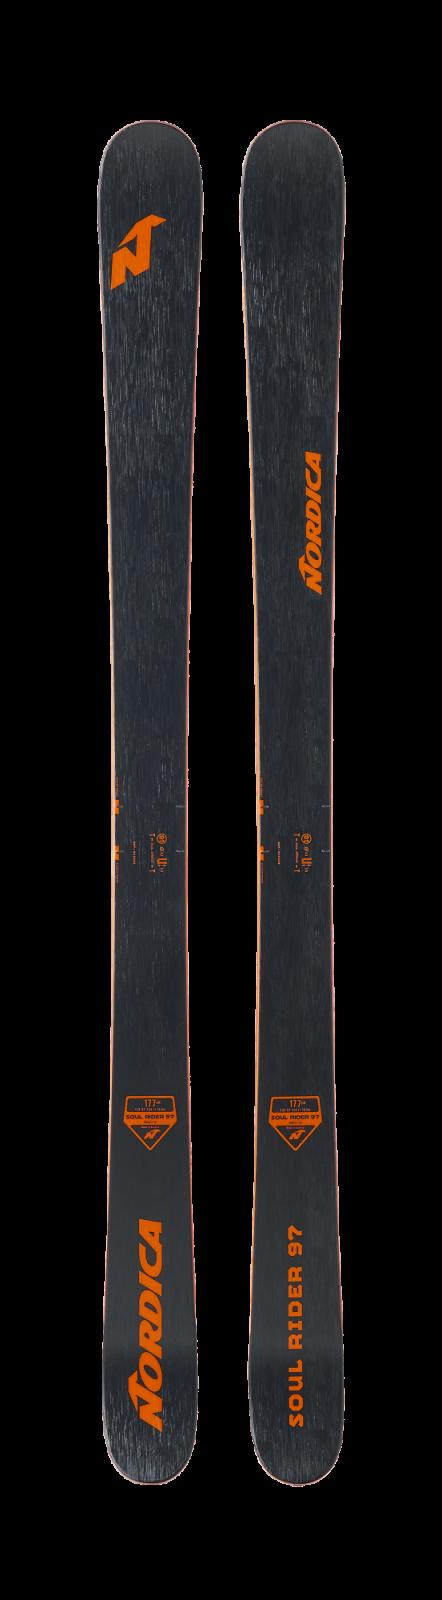 Nordica Soul Rider 97 Skis 2022